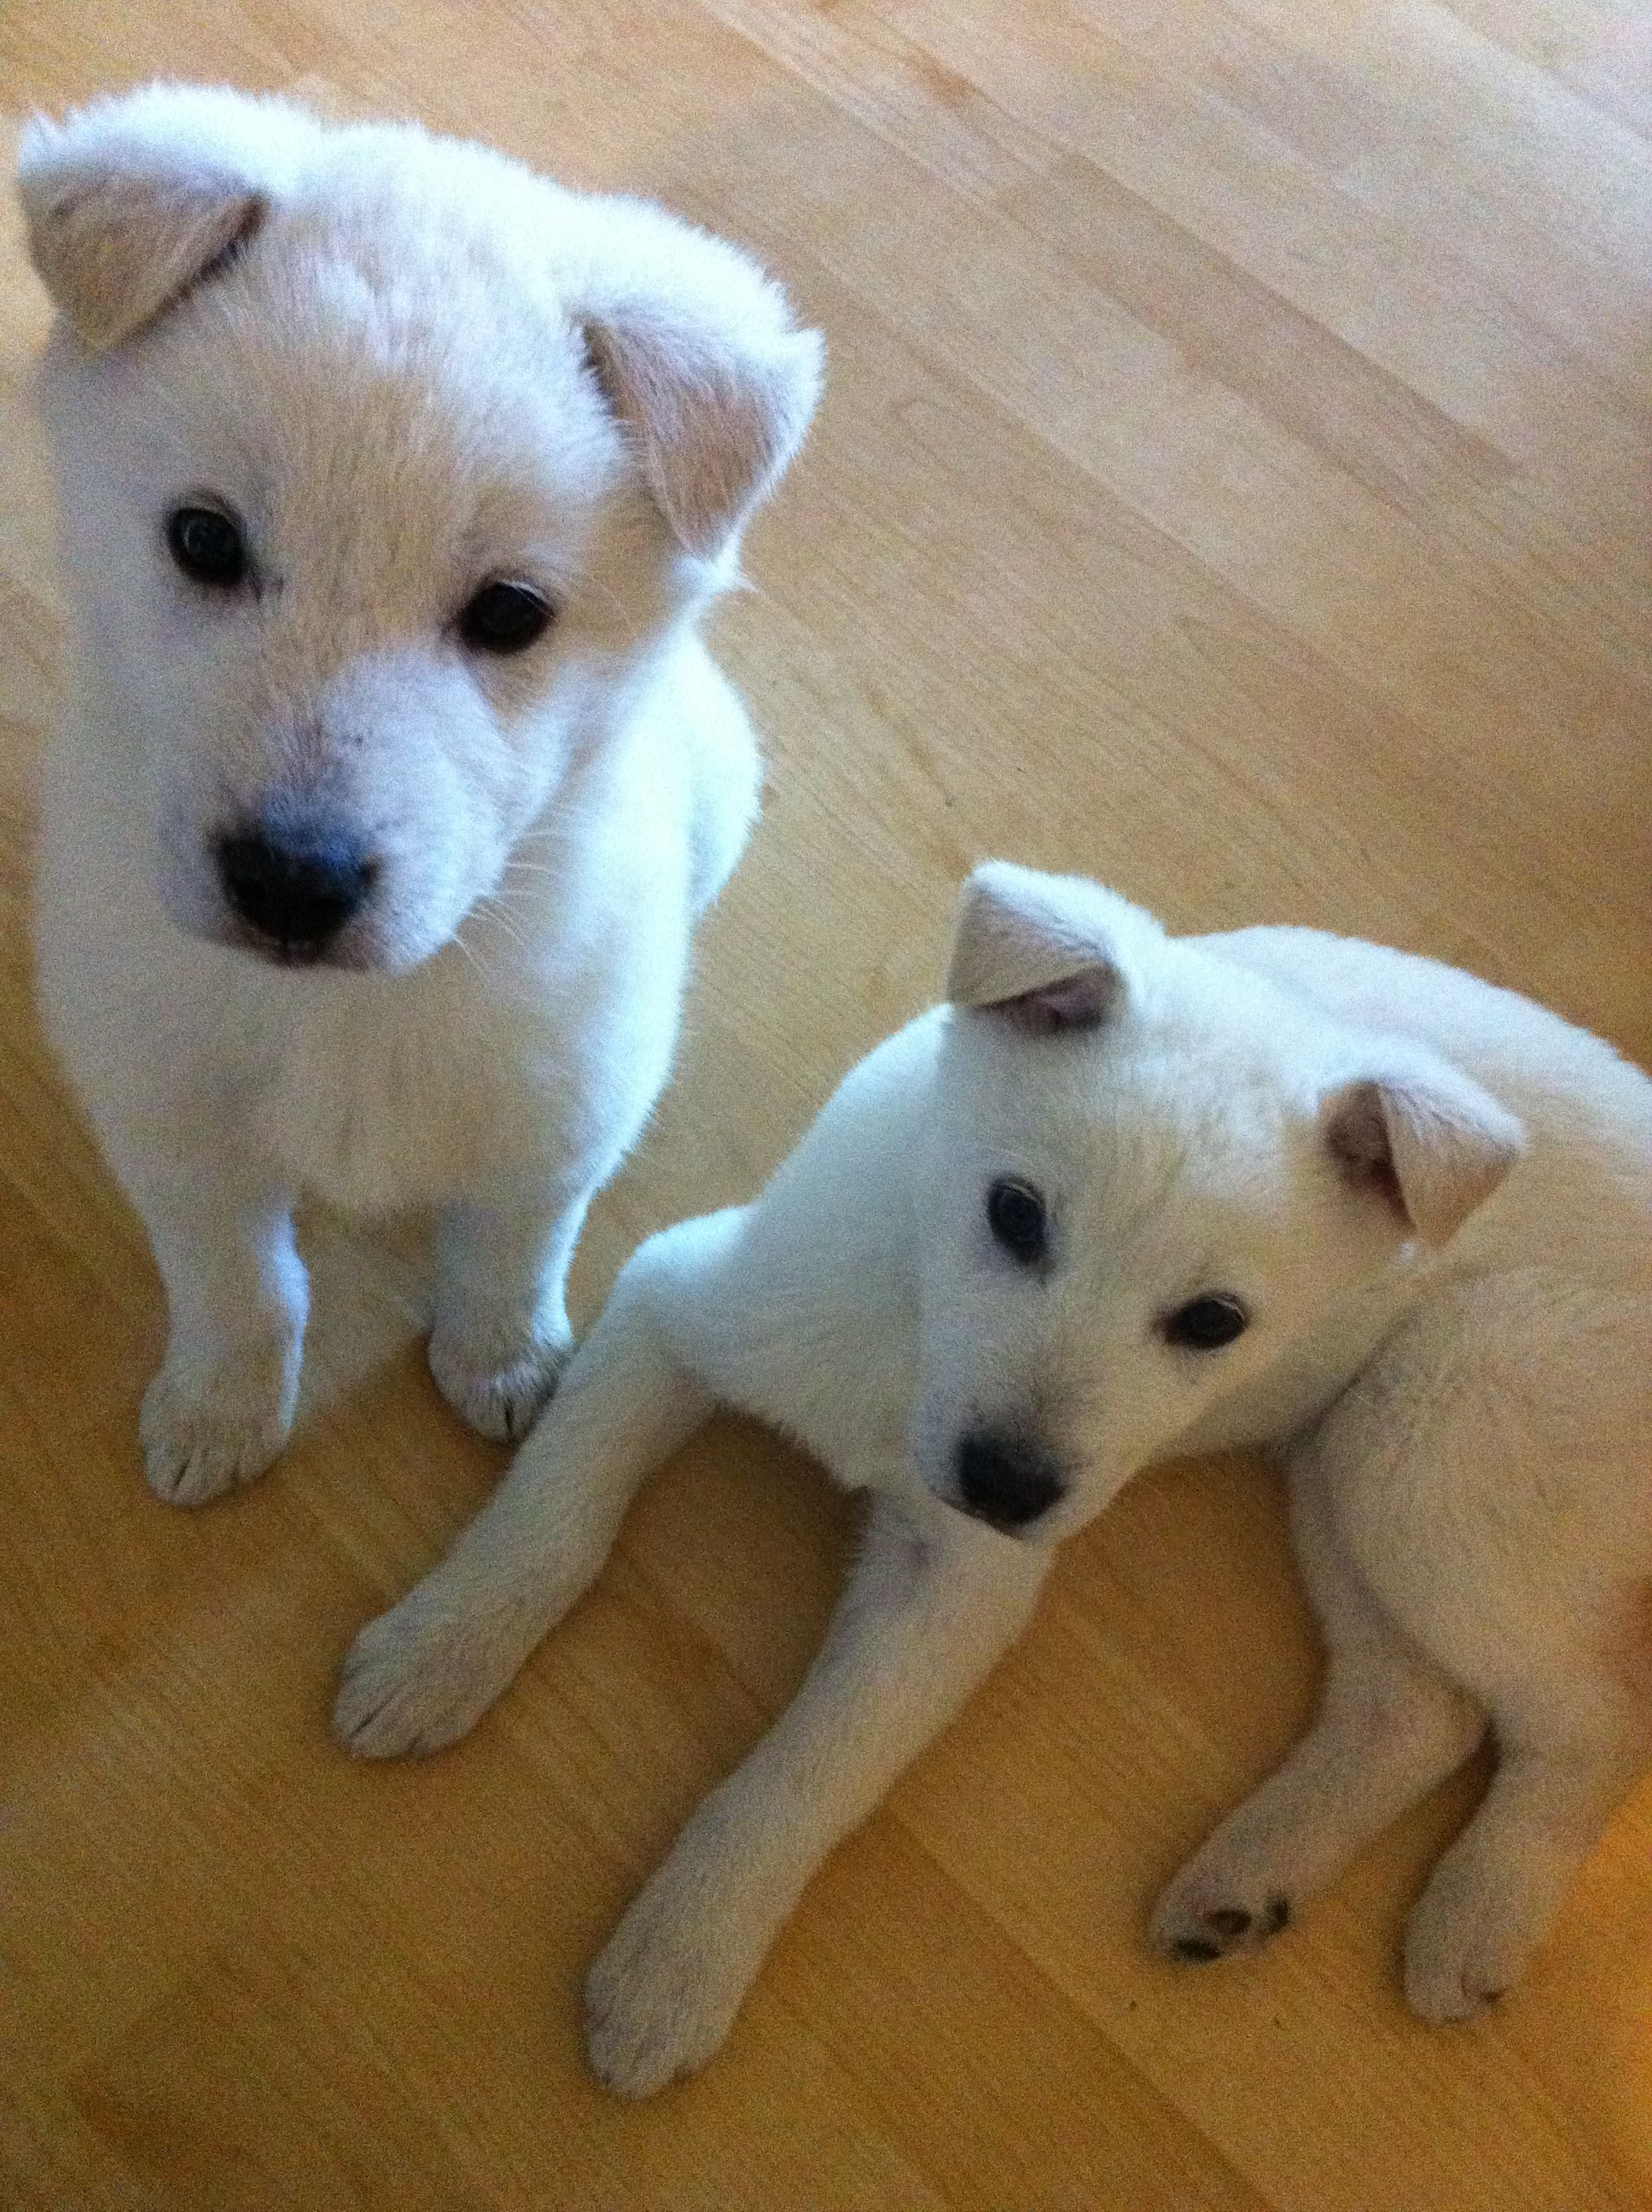 Korean Jindo Dog, Hangul Hanja, Chindo, Jindo, Jindo Gae, Jindogae